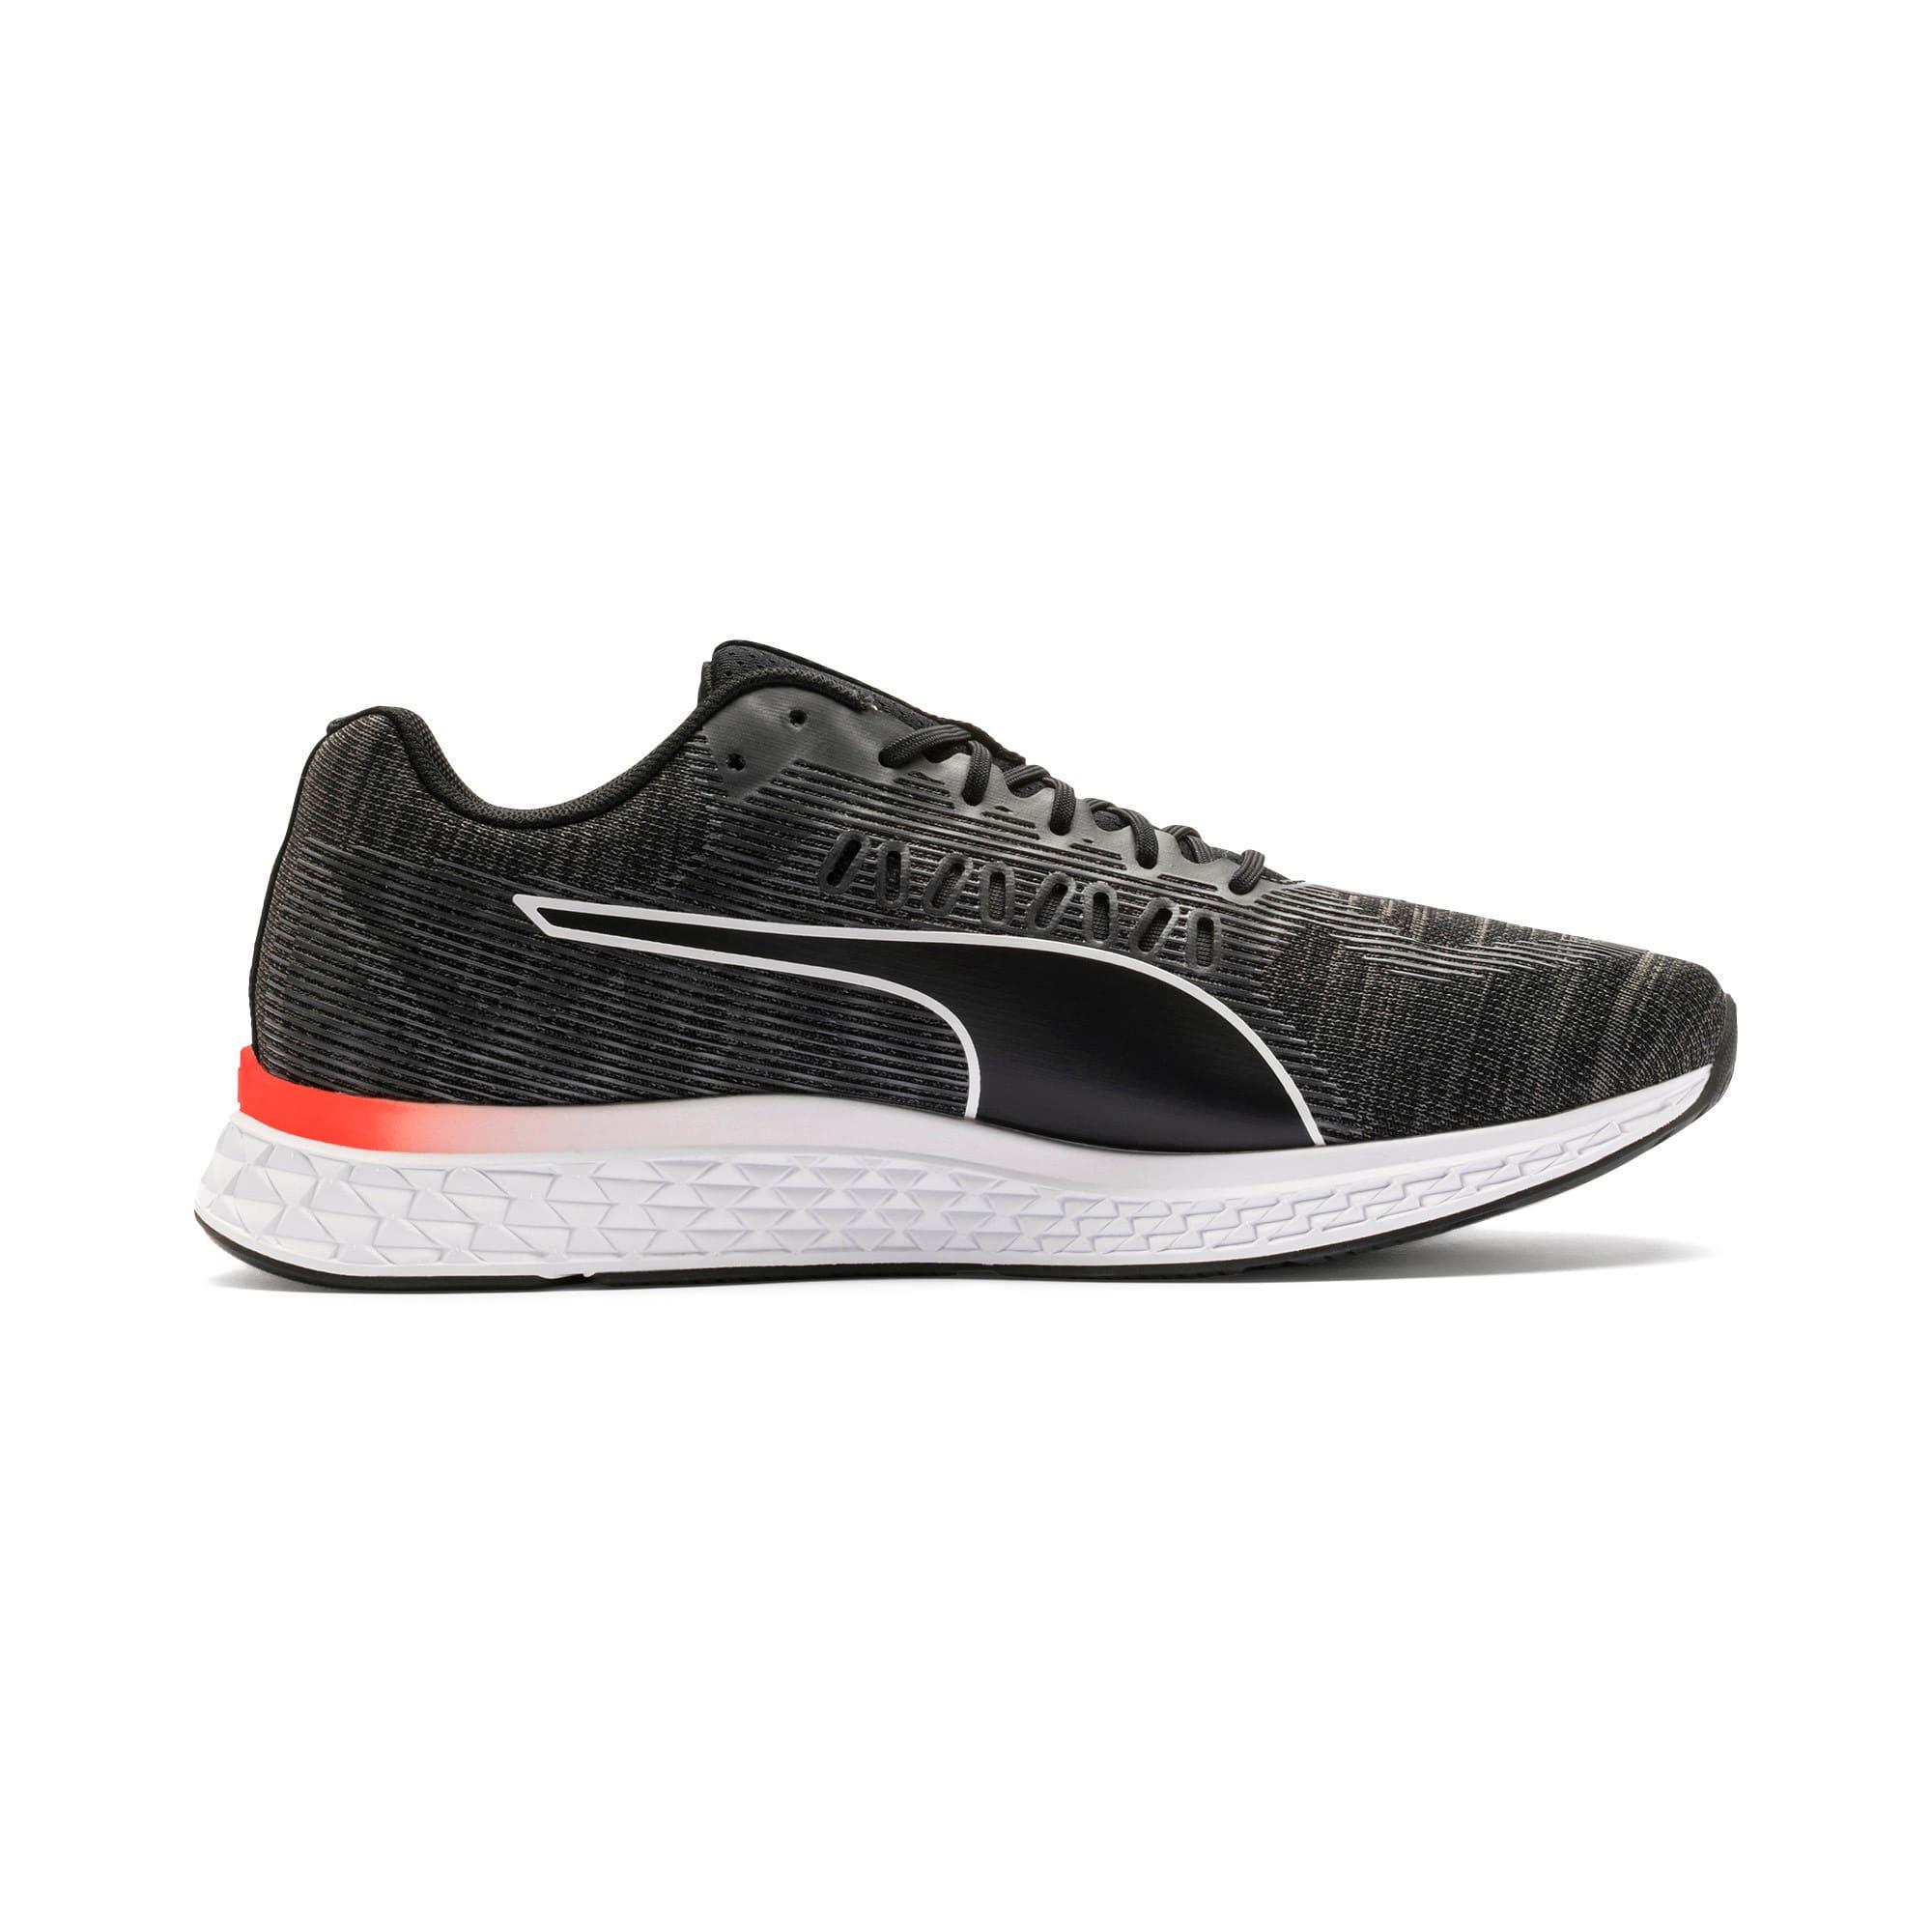 Thumbnail 6 of SPEED SUTAMINA Running Shoes, Black-CASTLEROCK-Yellow-Red, medium